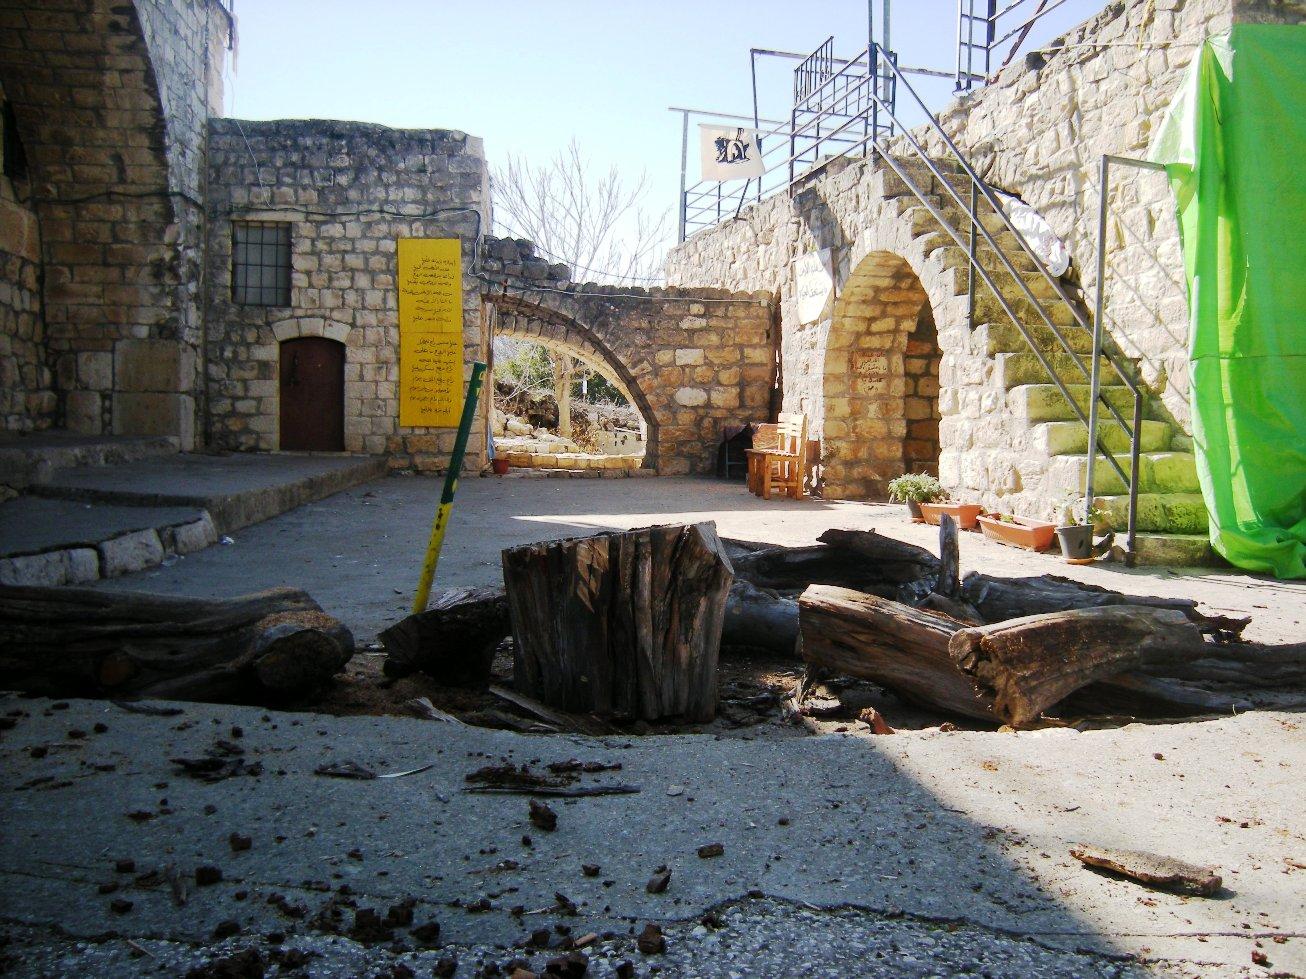 La chiesa e la scuola di Kufr Bi'rem (Foto: Chiara Cruciati)